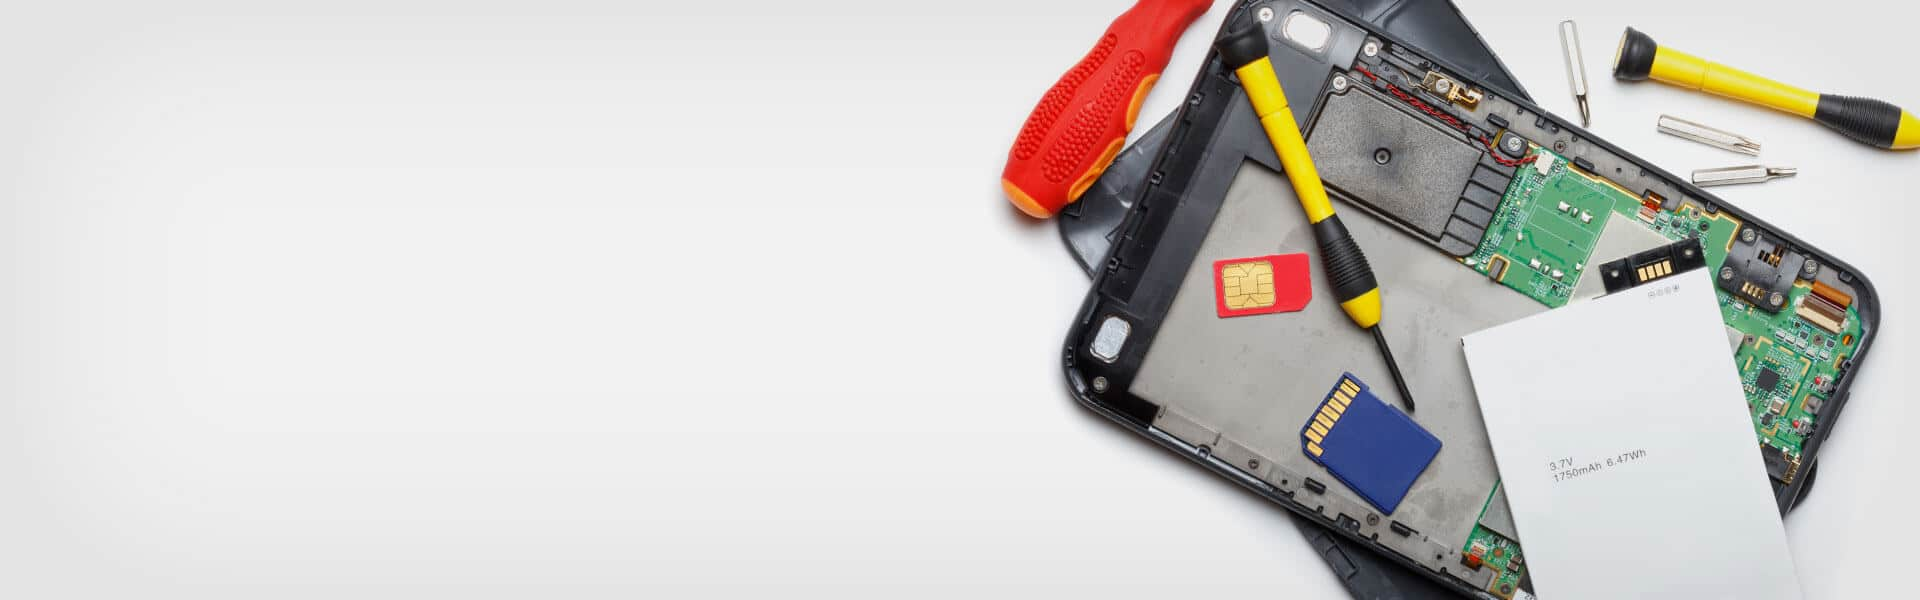 Reparatur express Xiaomi Smartphone Handy münchen